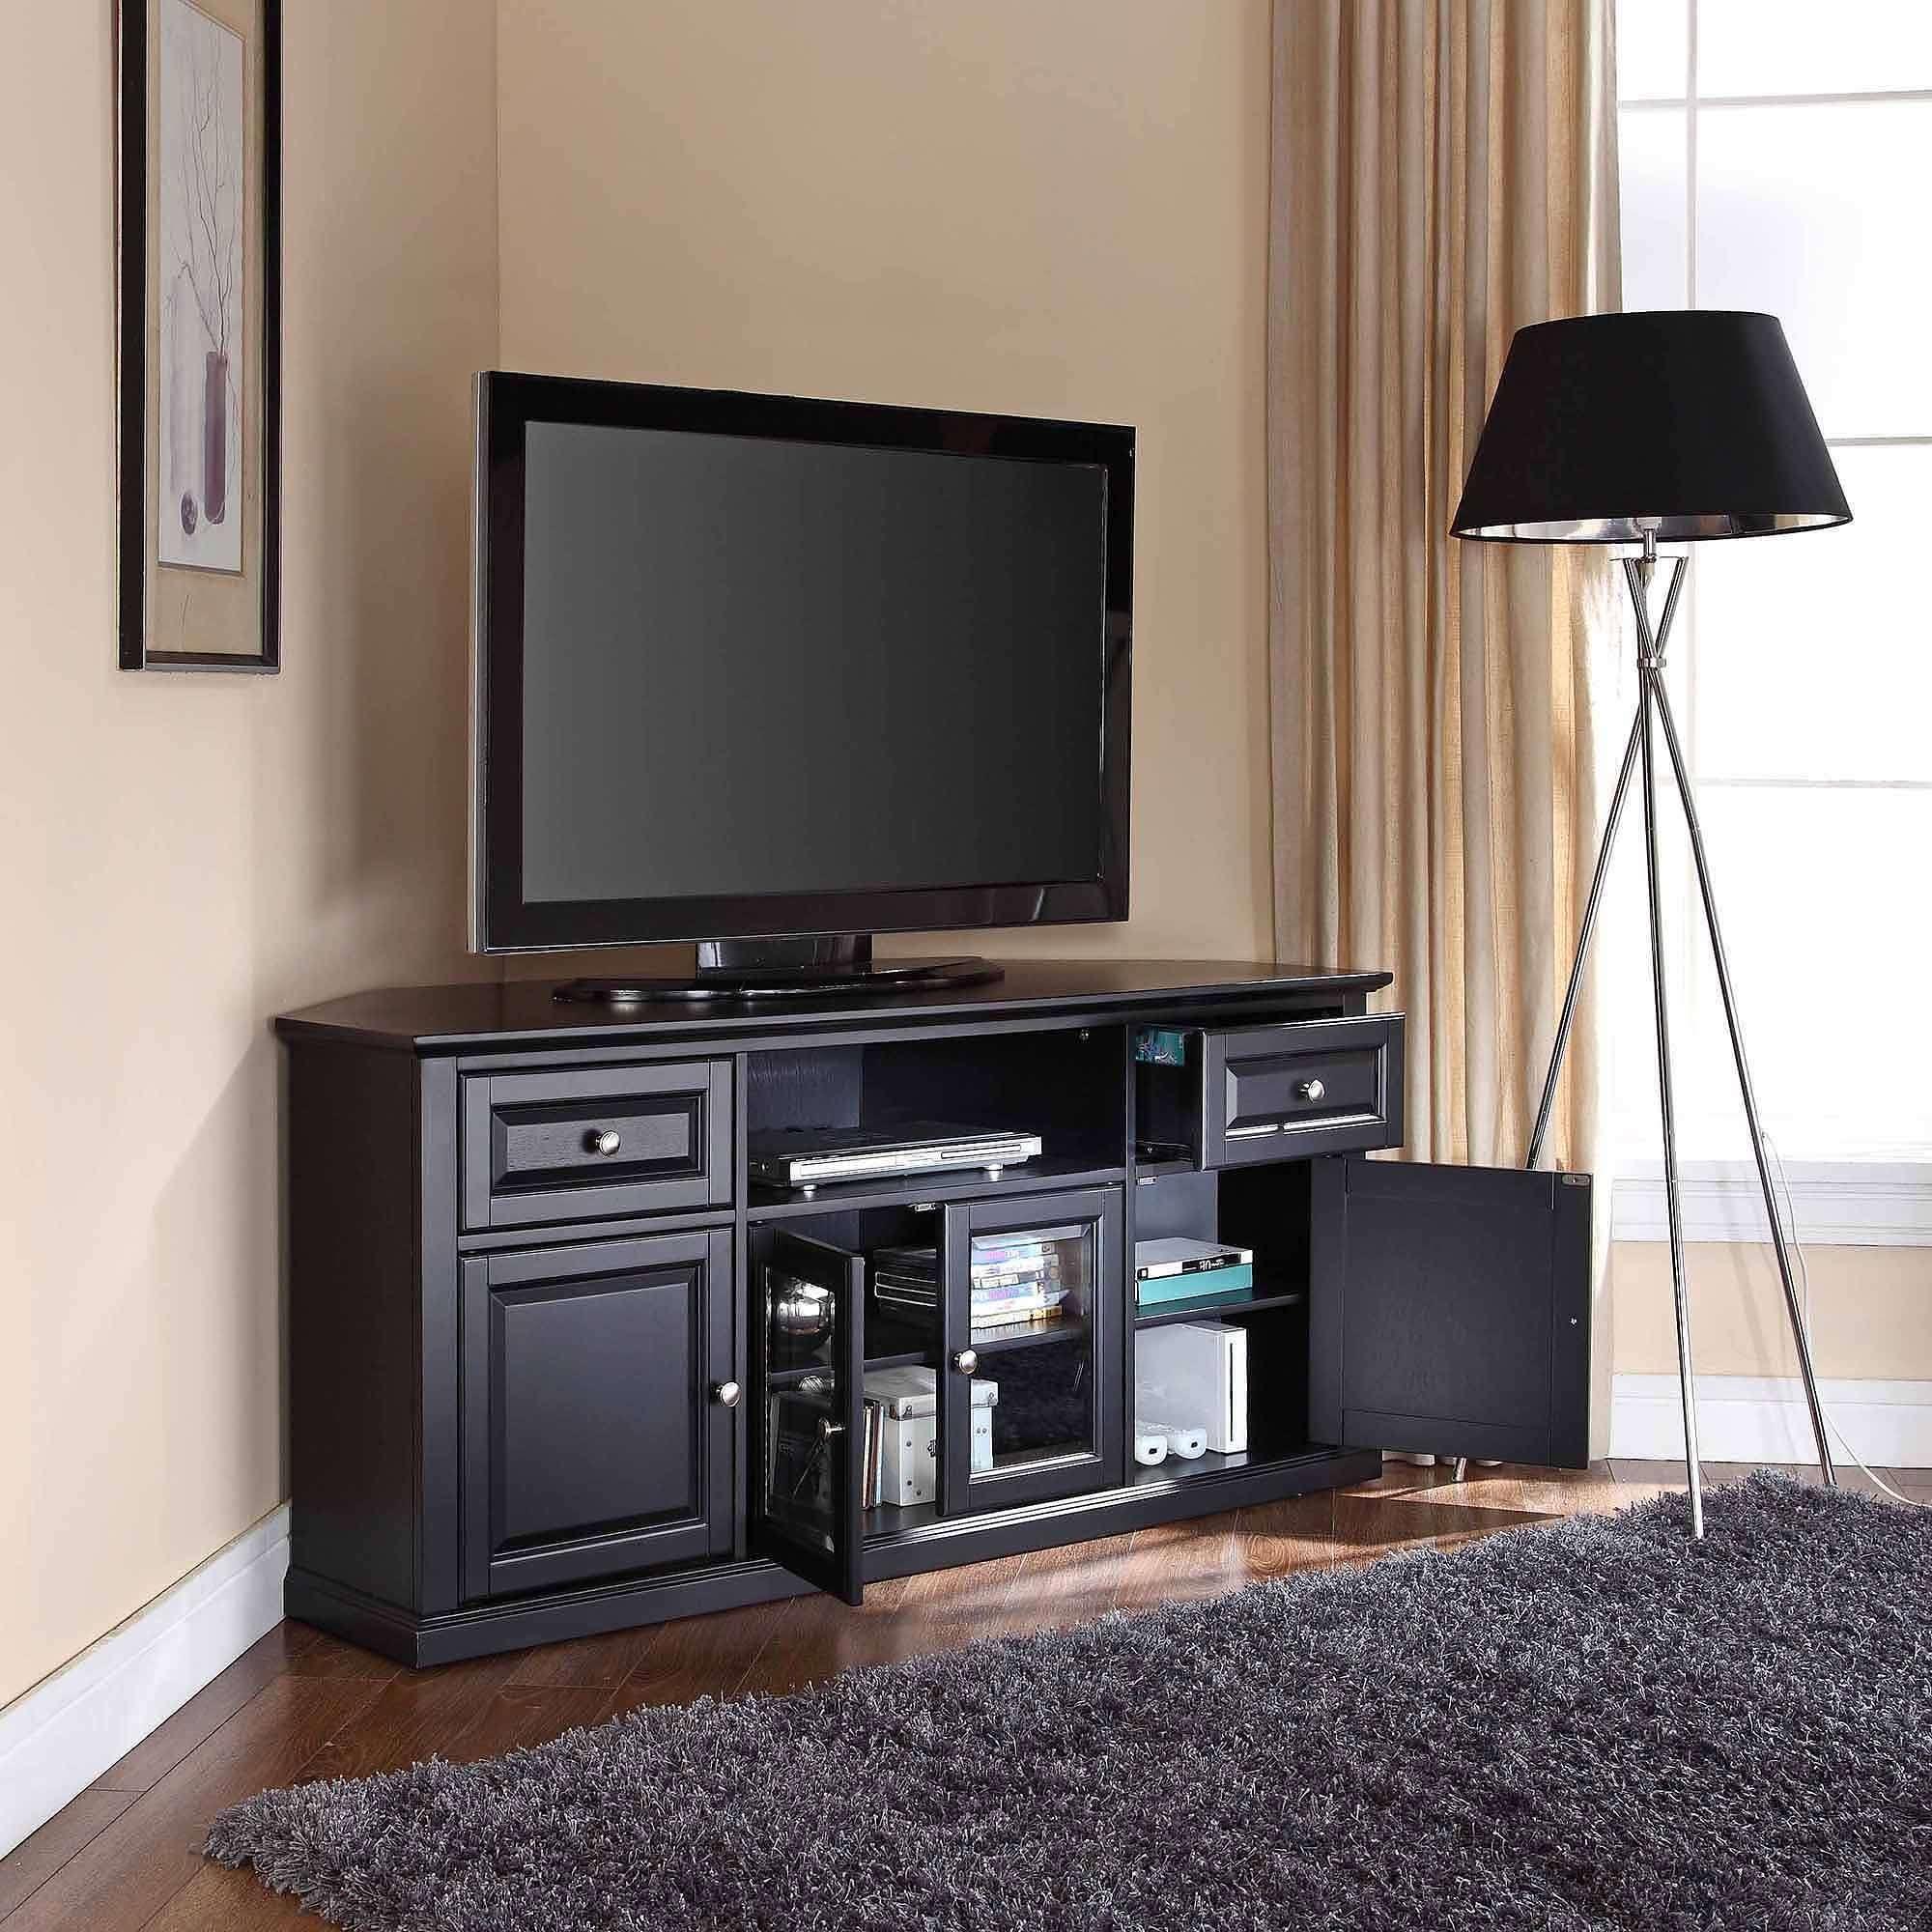 Tv Stand : 52 Literarywondrous Dark Brown Corner Tv Stand Photo Regarding Dark Brown Corner Tv Stands (View 4 of 20)